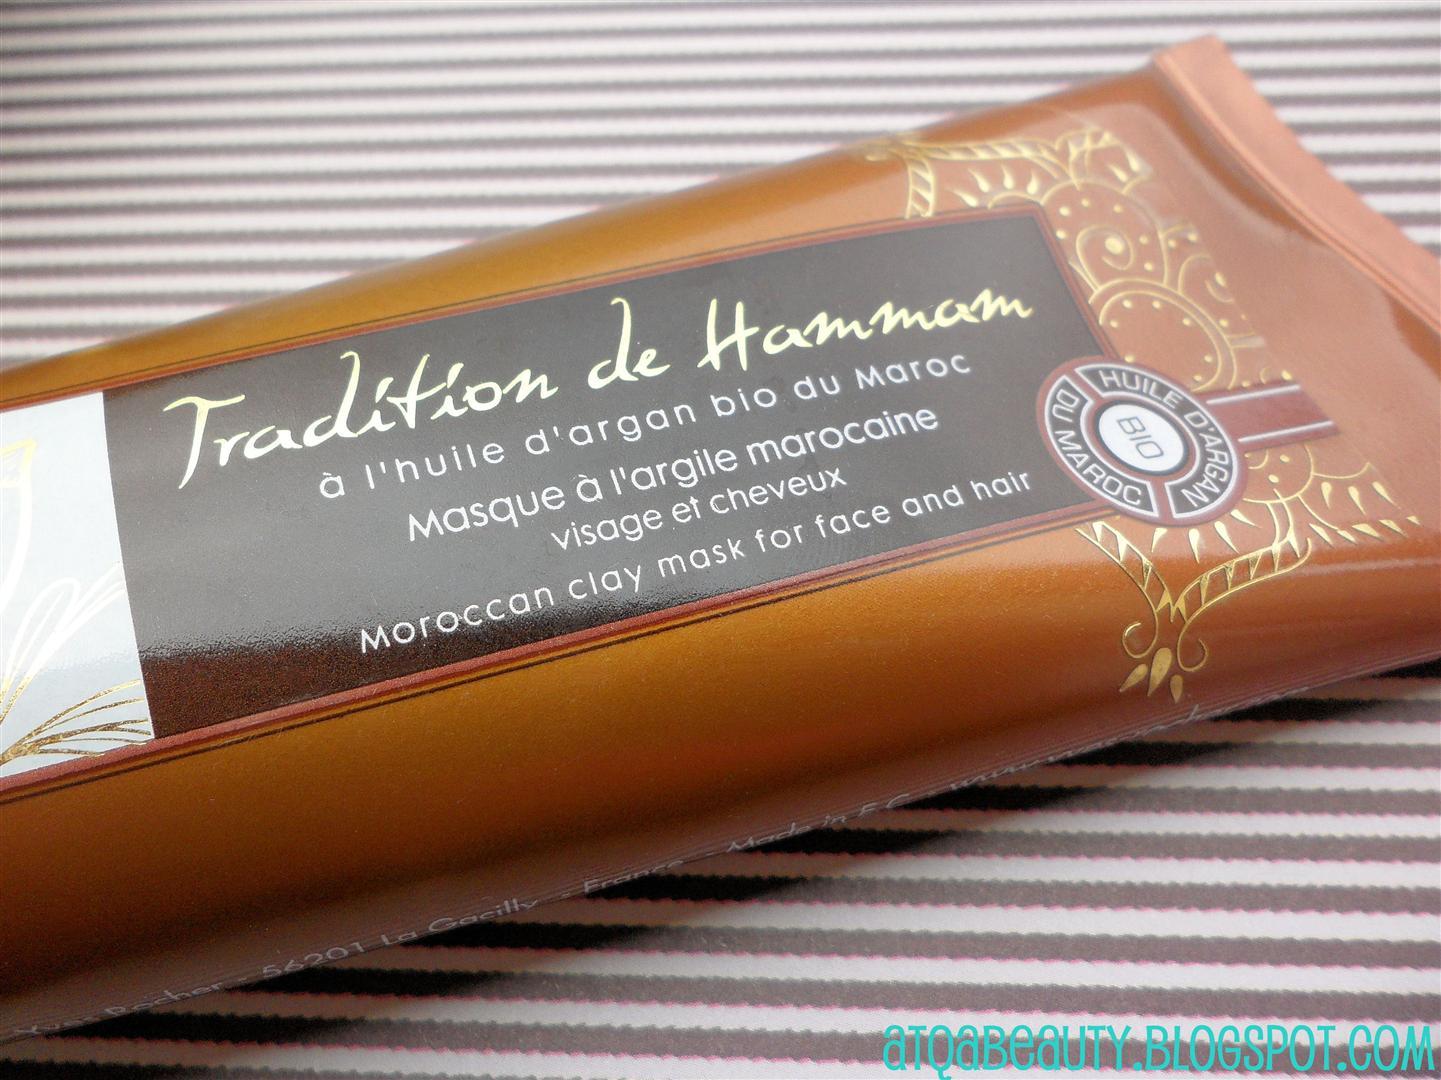 Pielęgnacja :: Yves Rocher, Tradition de Hammam <br>– balsam i maseczka